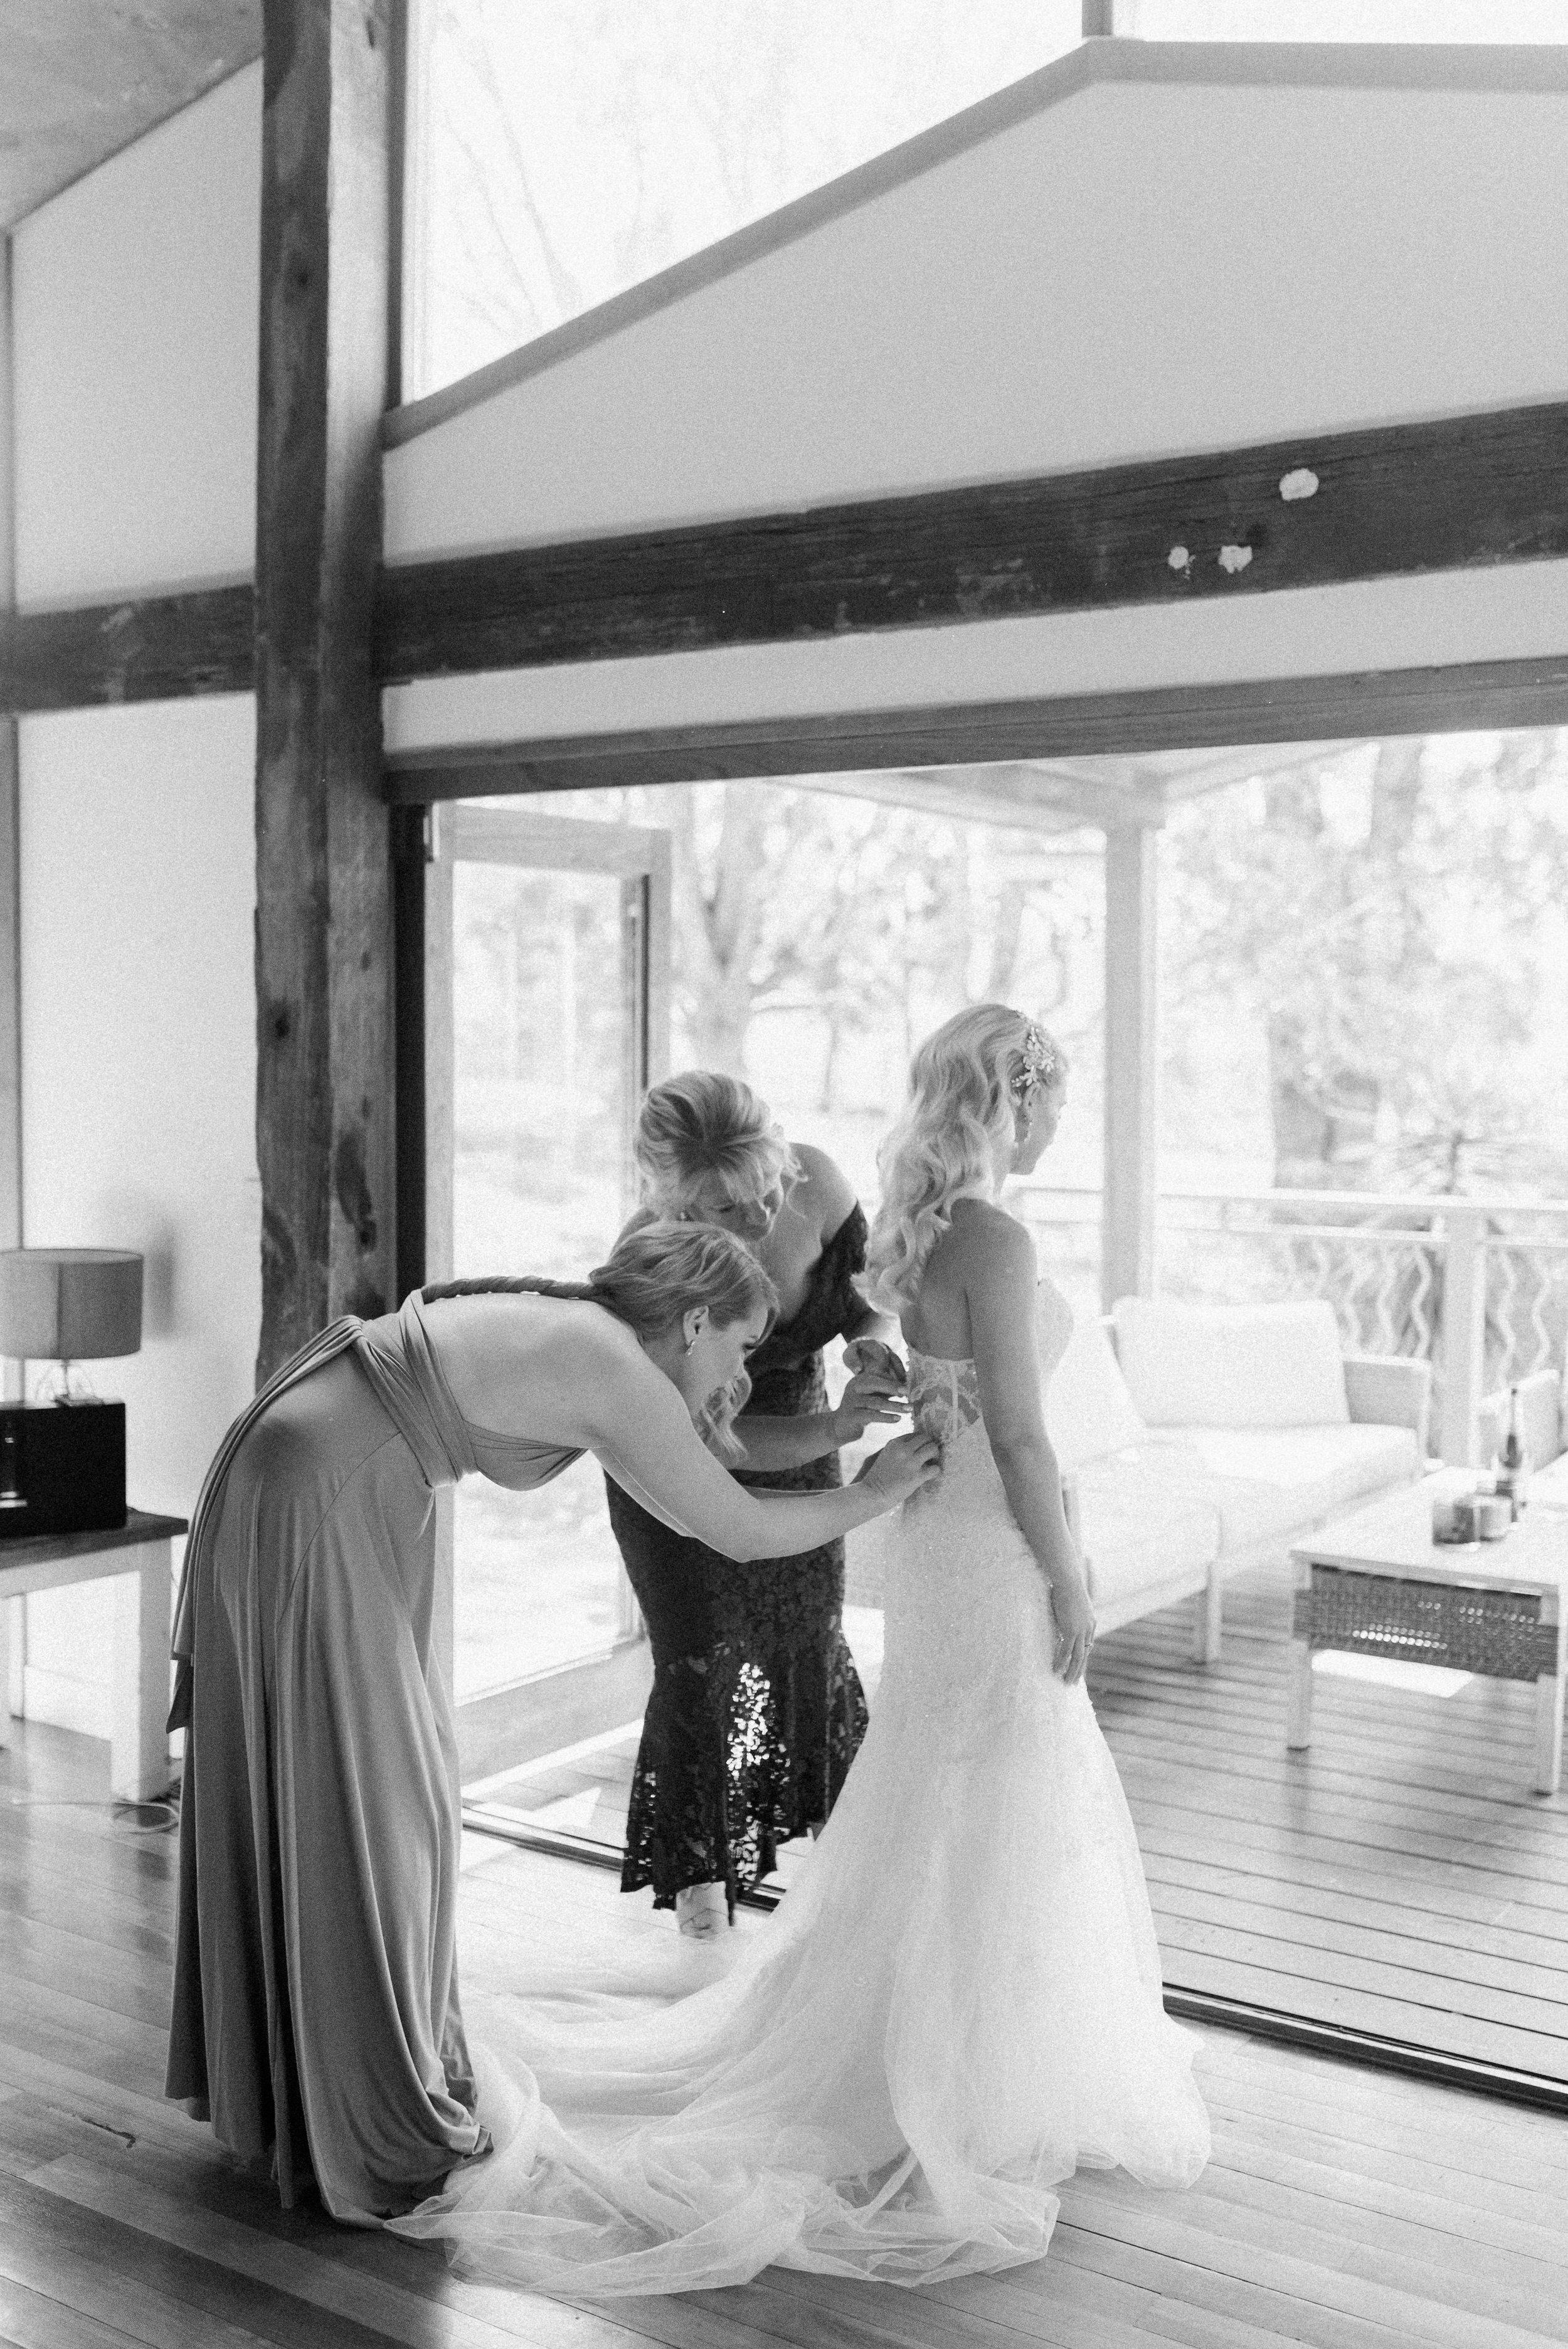 Kooroomba-Vineyard-Lavender-Farm-Wedding-Fine-Art-Lauren-Olivia-9.jpg